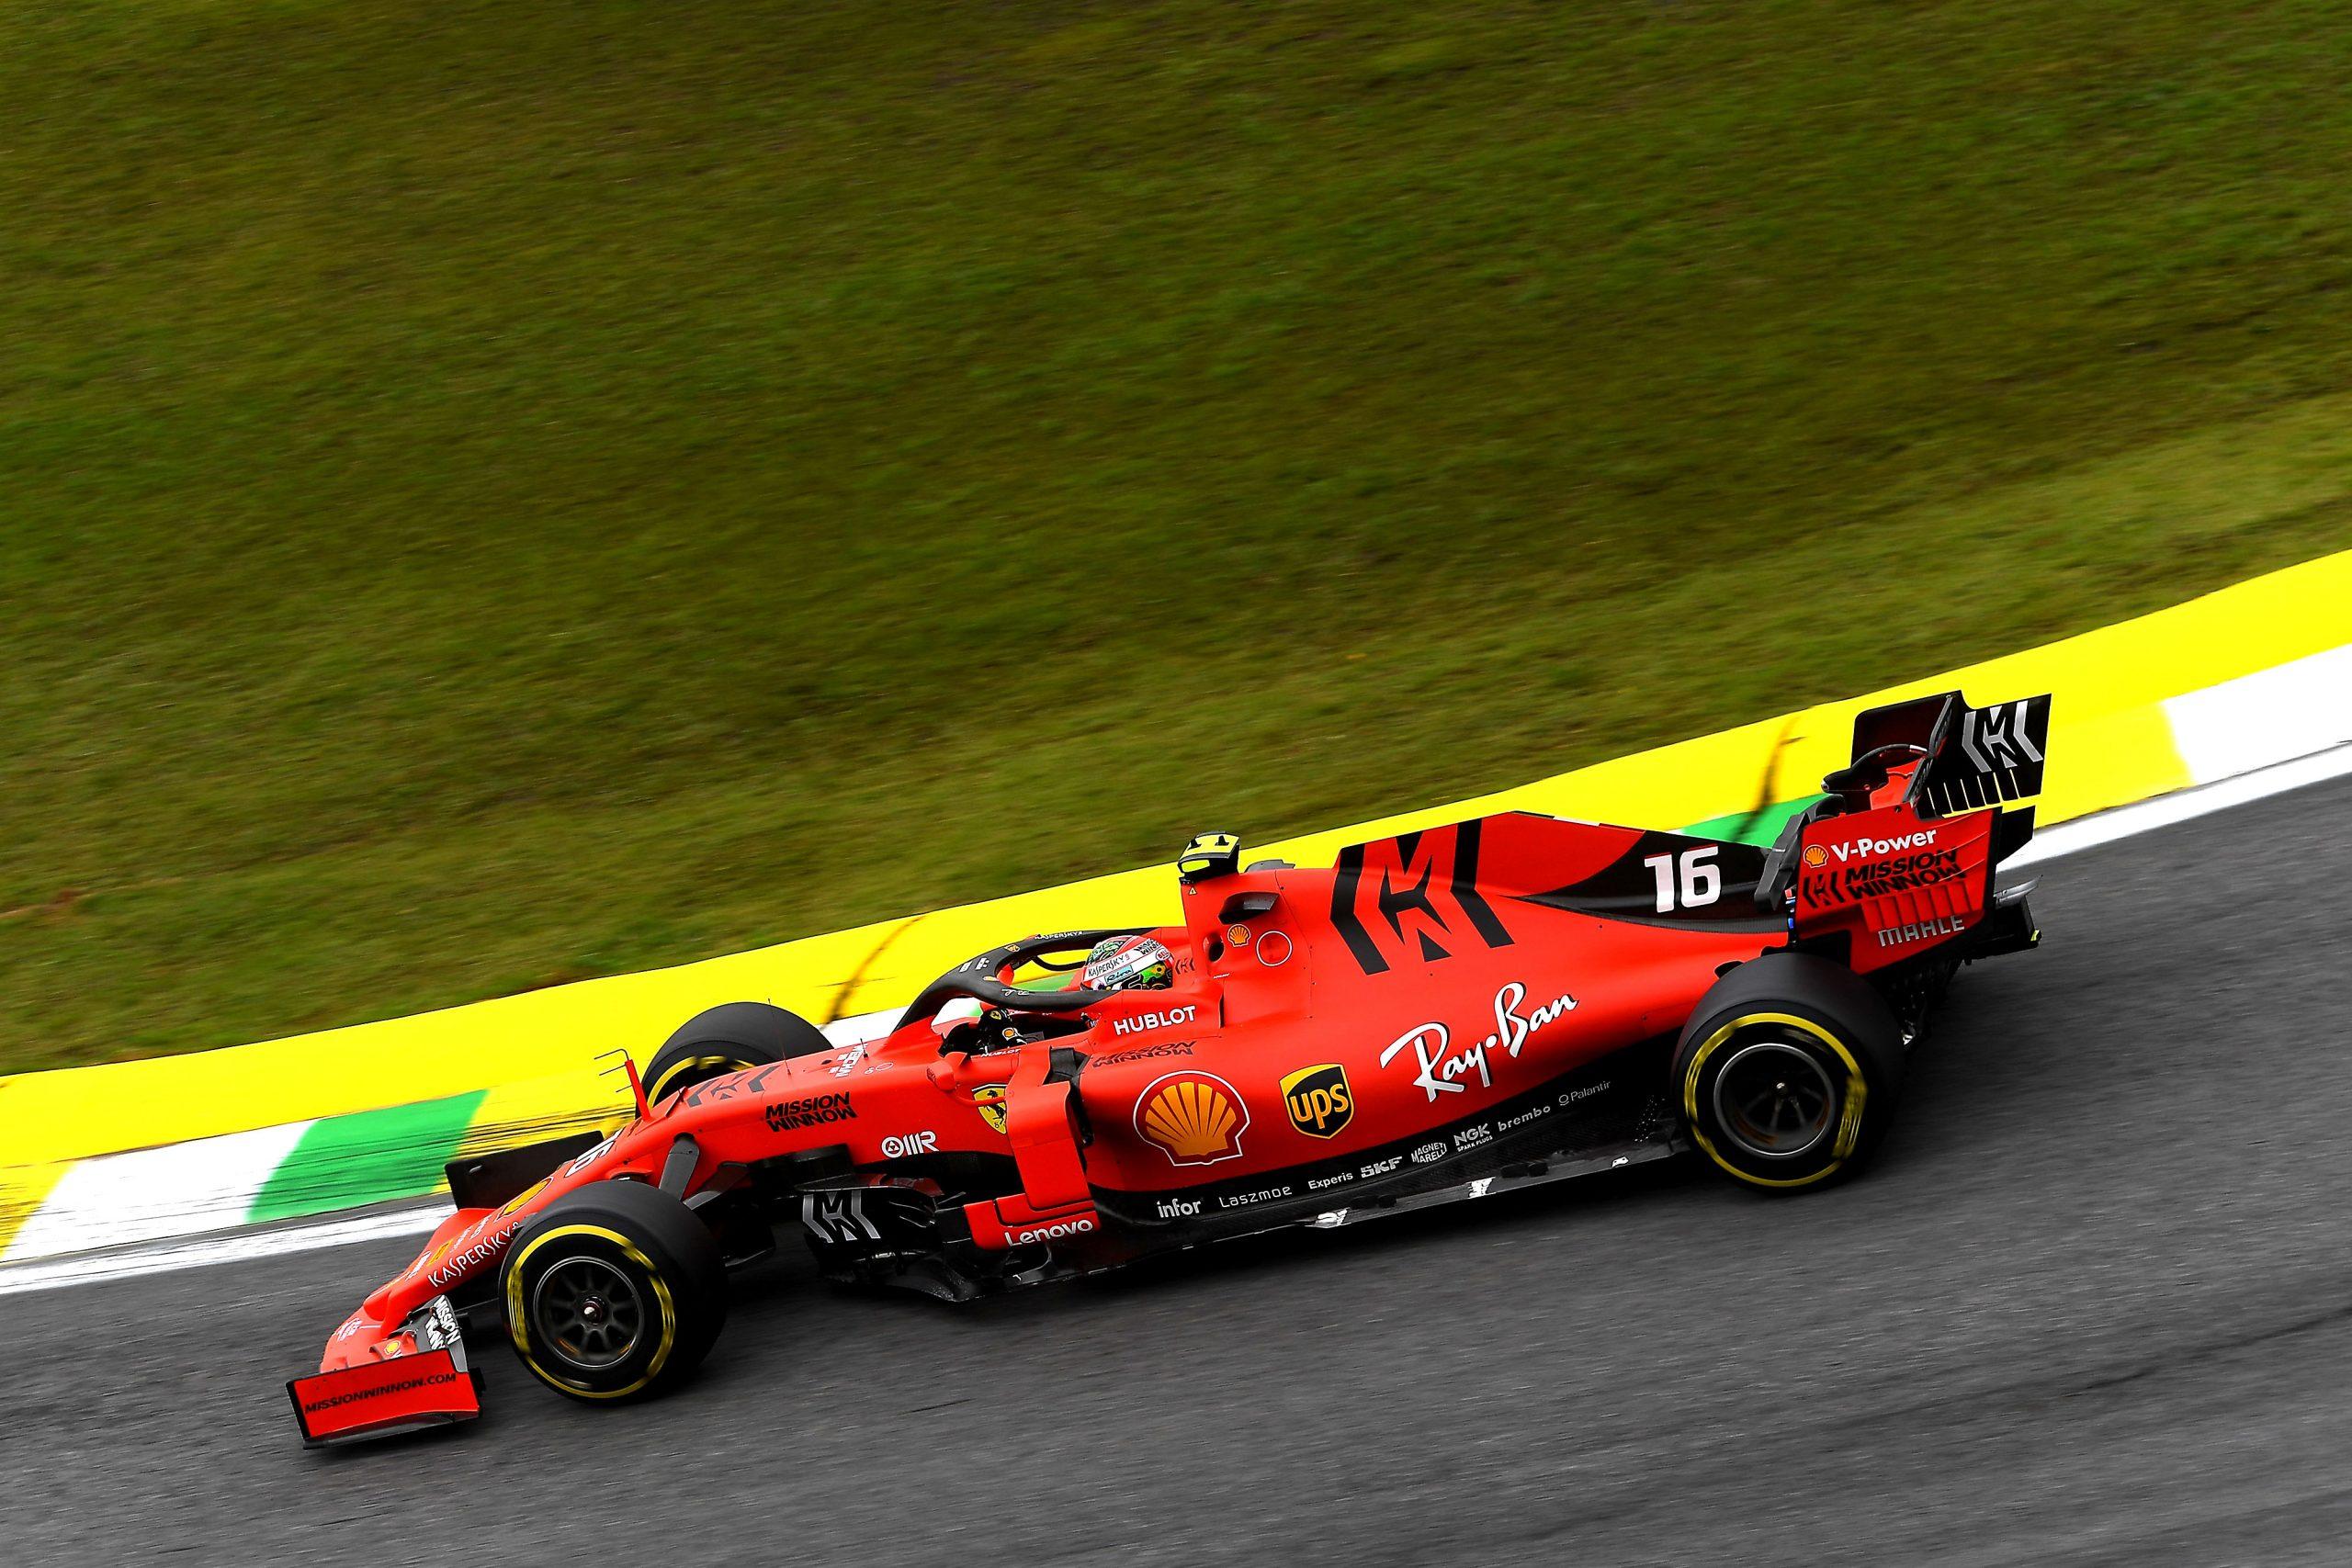 F1 Formula 1 Formula One Brazilian Grand Prix practice results FP3